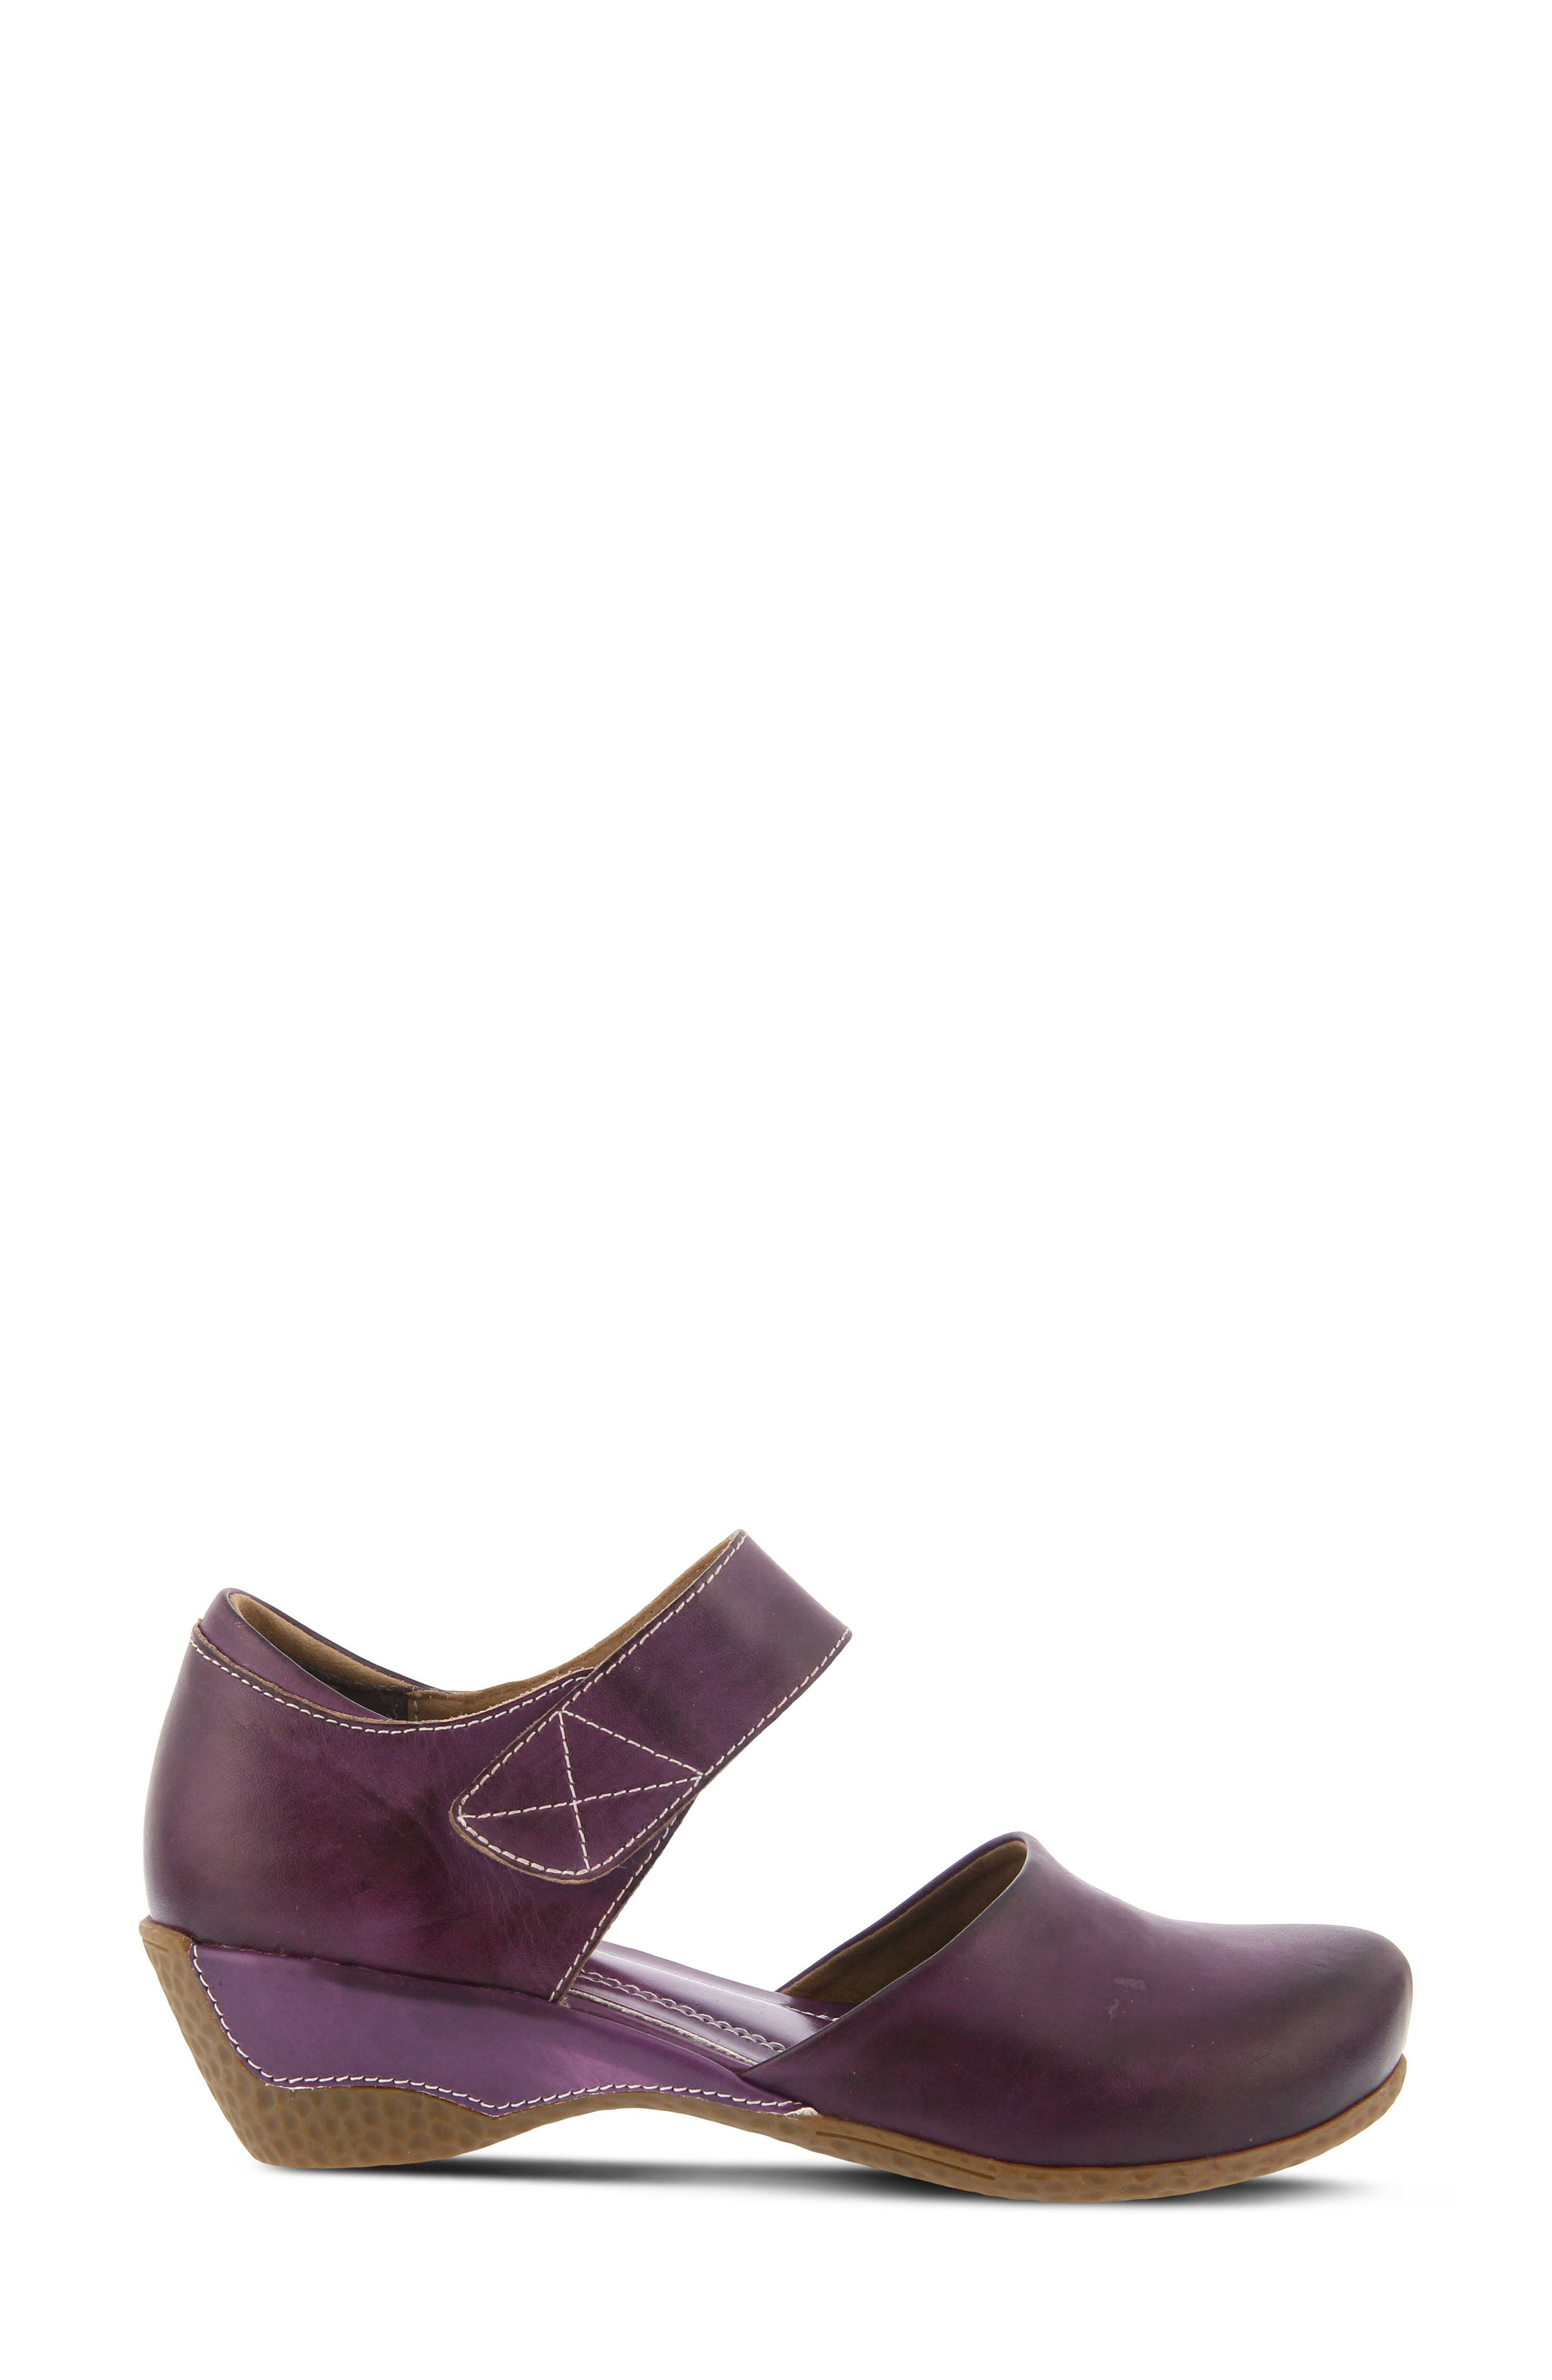 L'Artiste Gloss Mary Jane Pump,                             Alternate thumbnail 3, color,                             Purple Leather